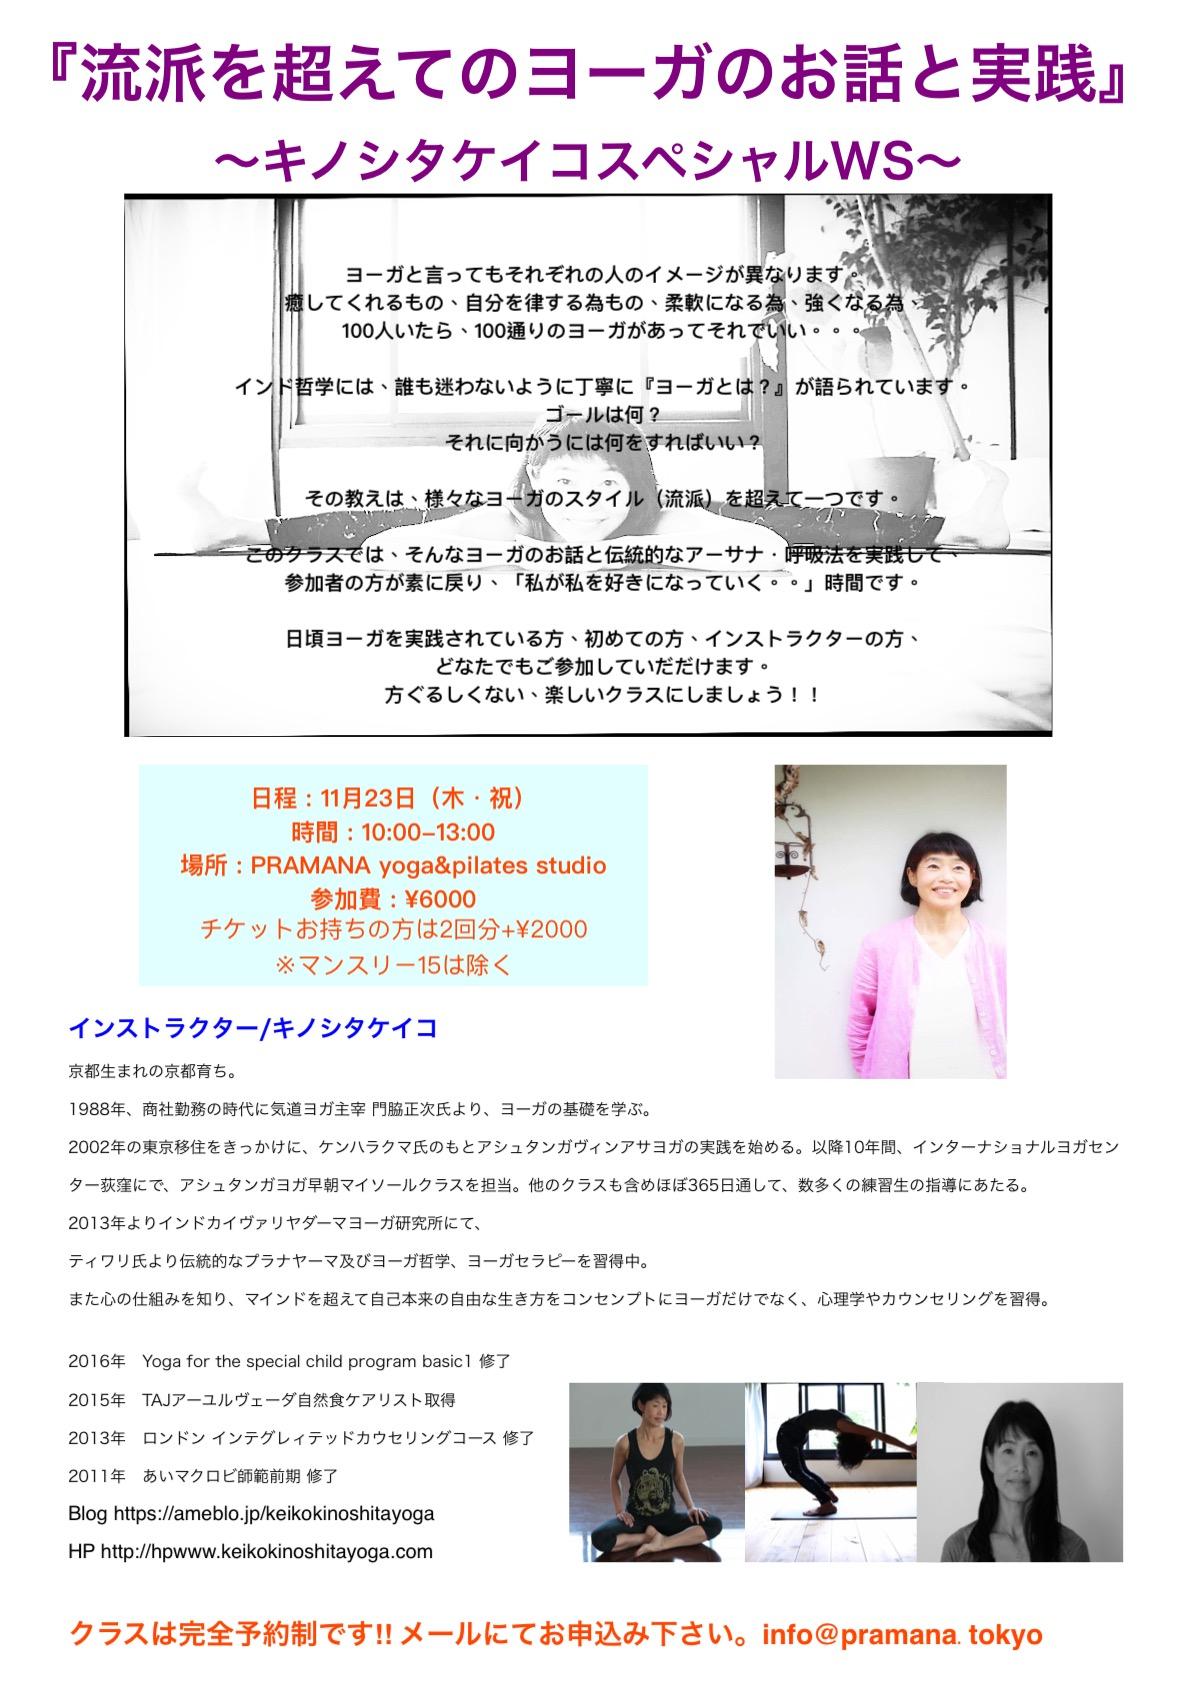 PRAMANA yoga&pilates studio - ◆流派を超えてヨーガのお話と実践◆〜キノシタケイコスペシャルWS〜の写真3